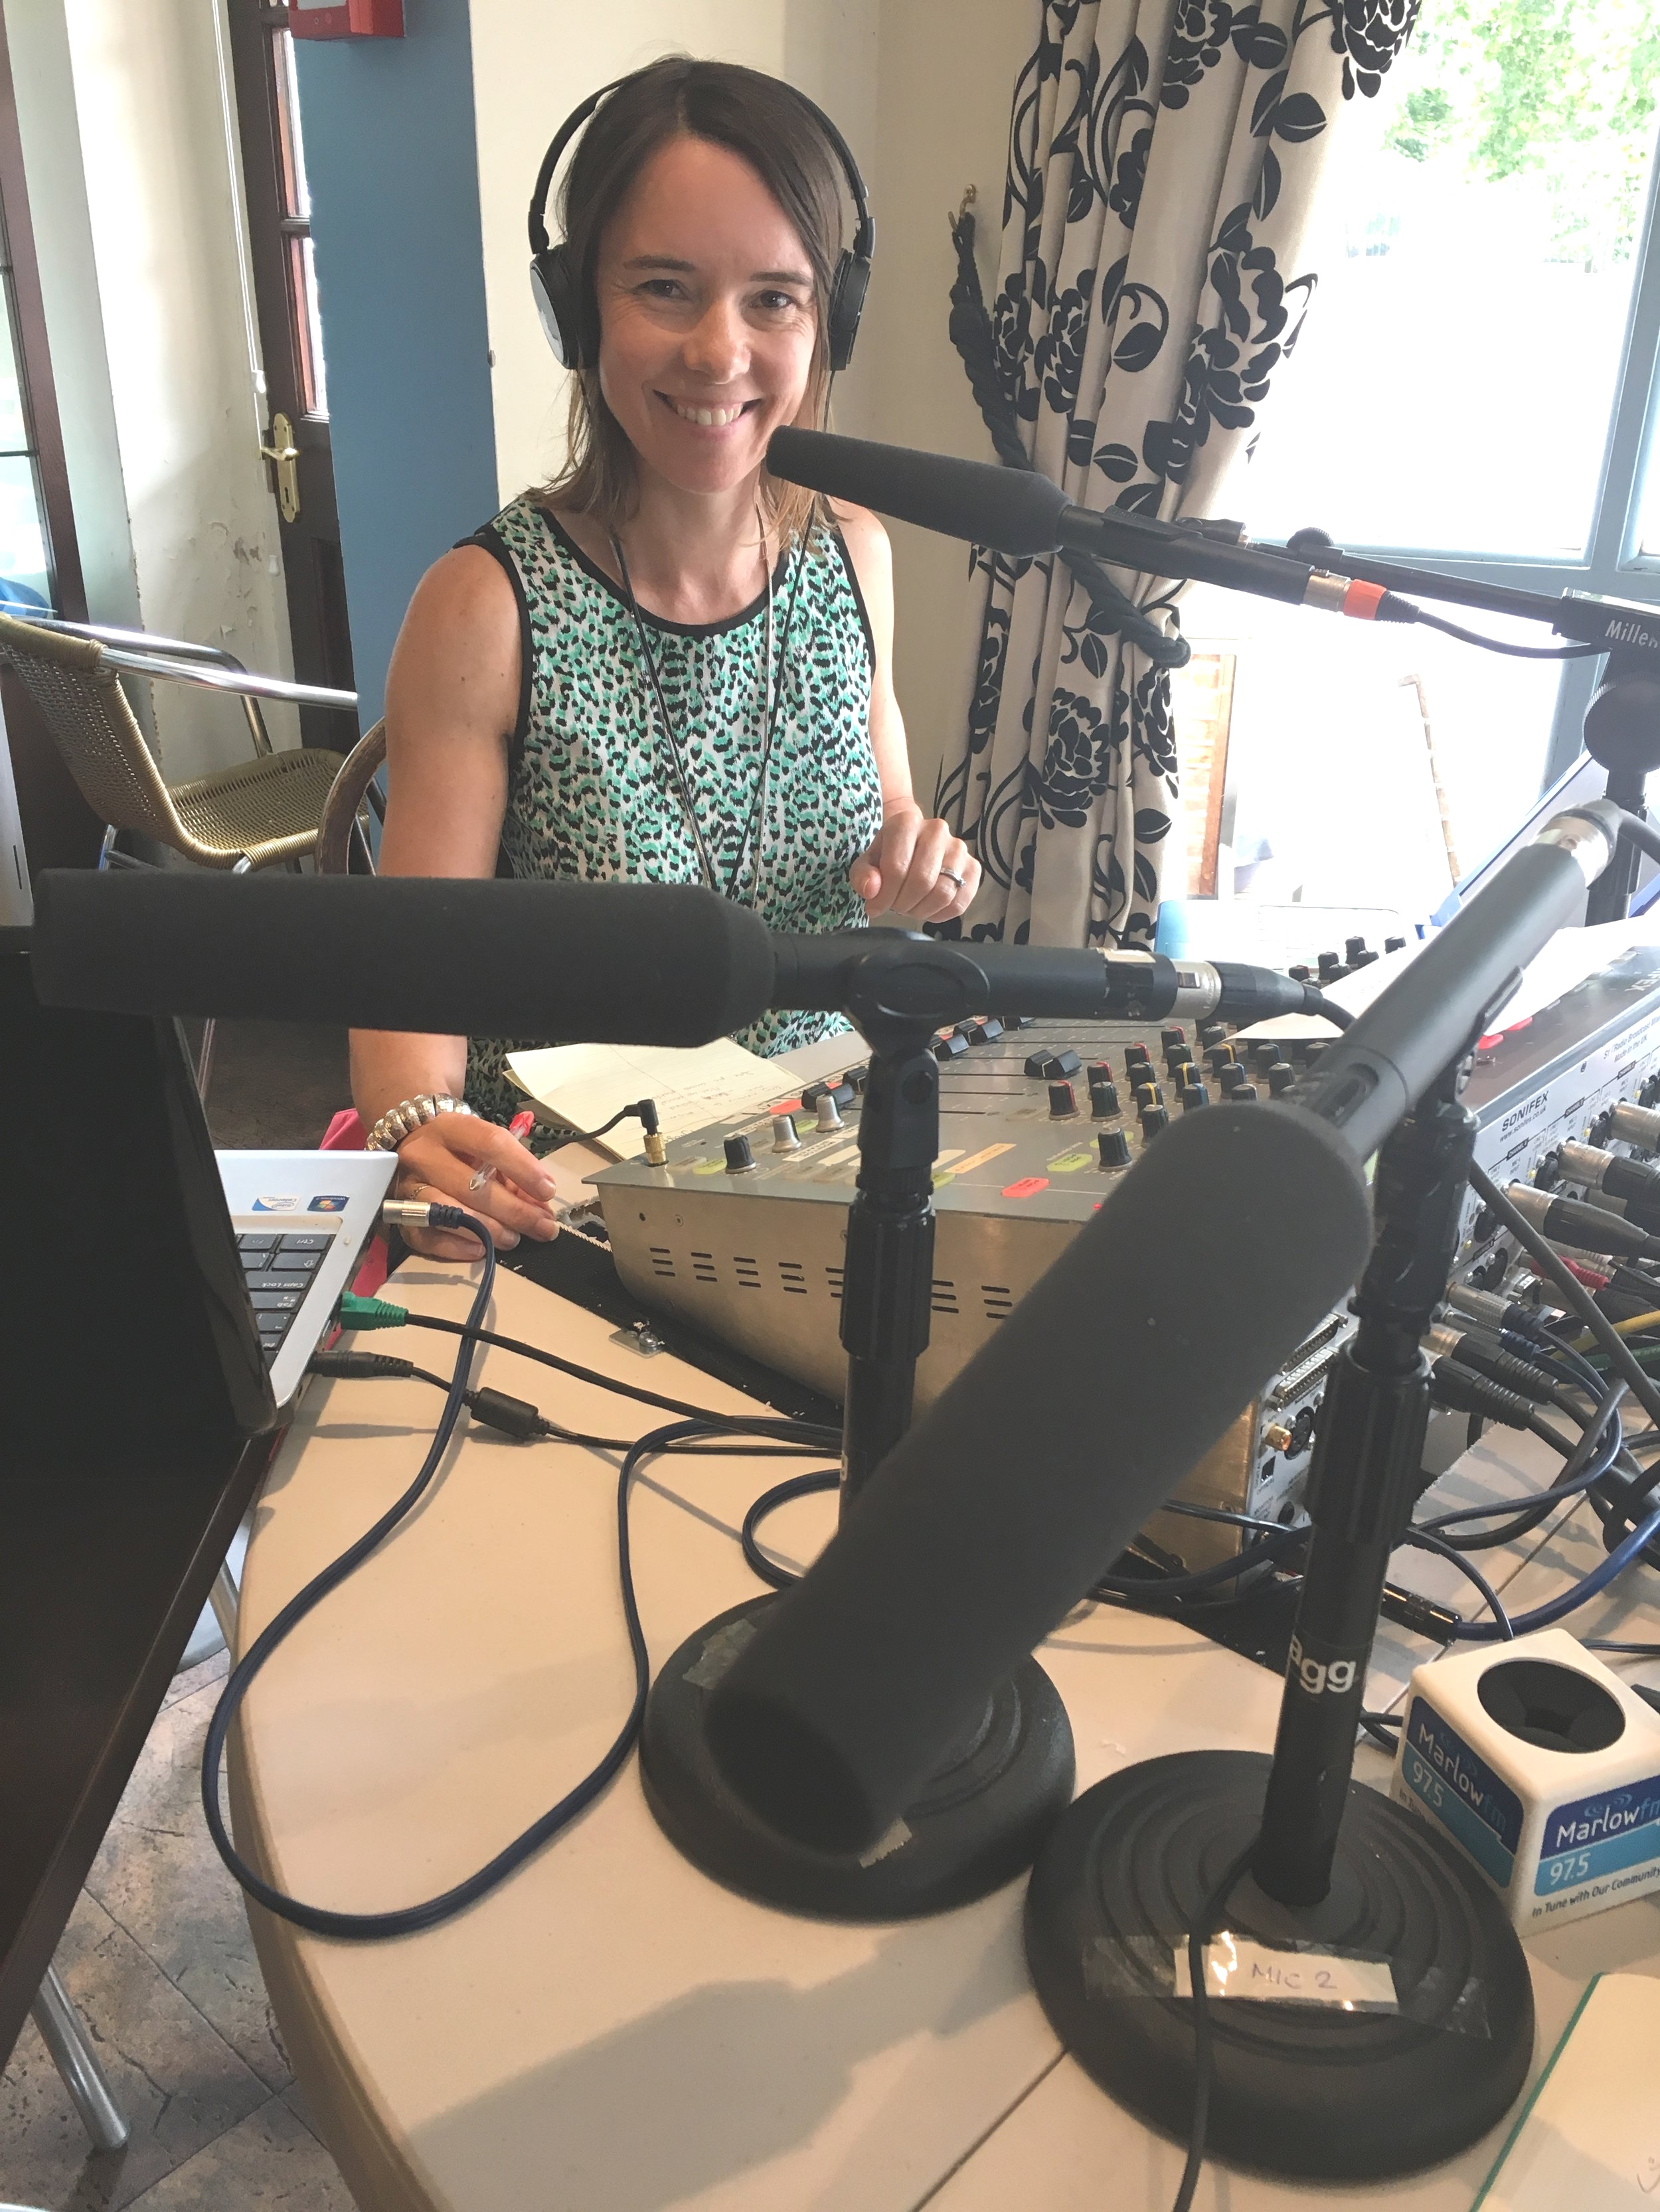 Carola Moon at MarlowFM's The Buzz - Radio Interview with Melissa Gale 3.jpg